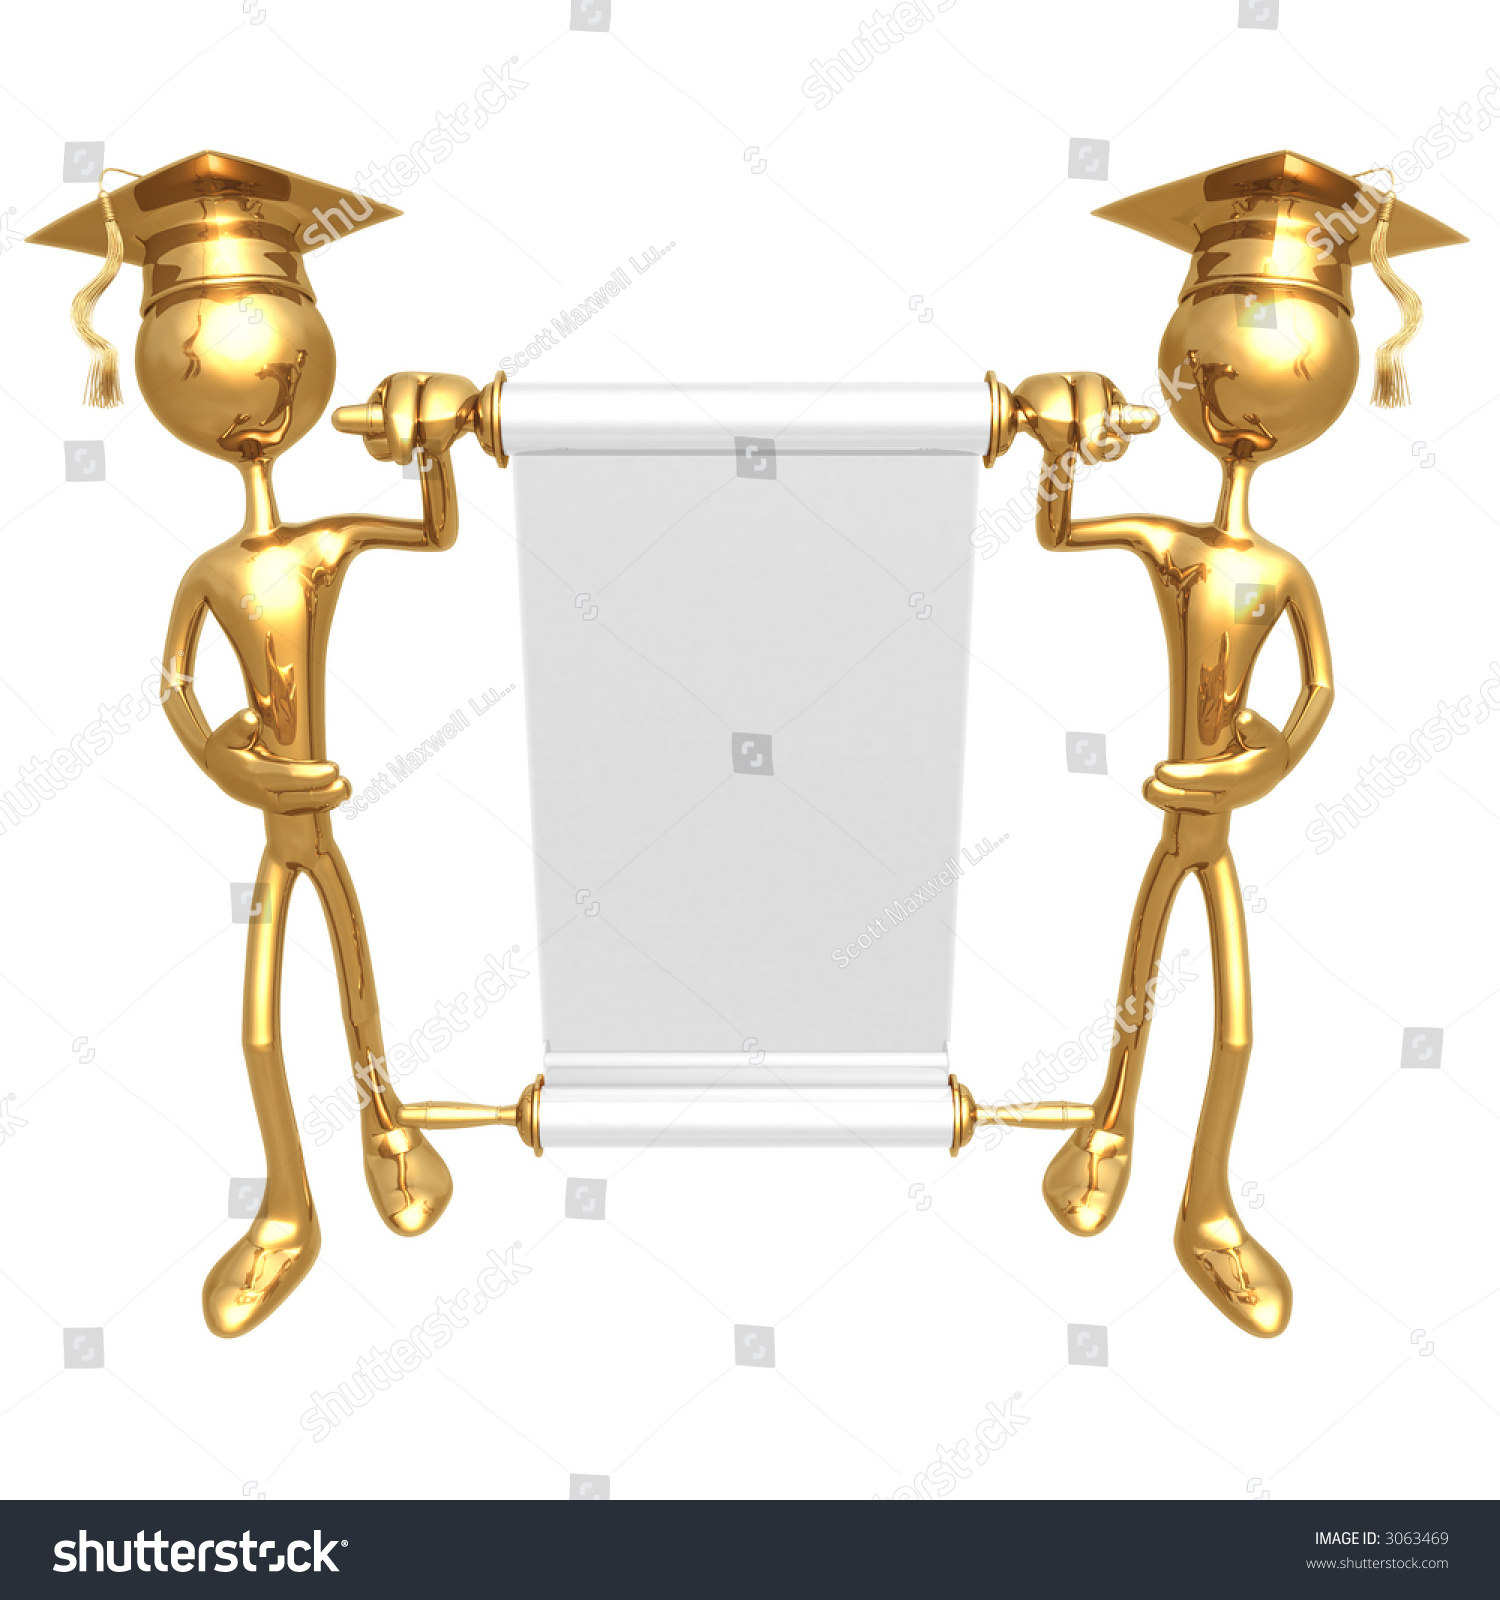 golden grad 39 s presenting a blank scroll graduation concept stock photo 3063469 shutterstock. Black Bedroom Furniture Sets. Home Design Ideas